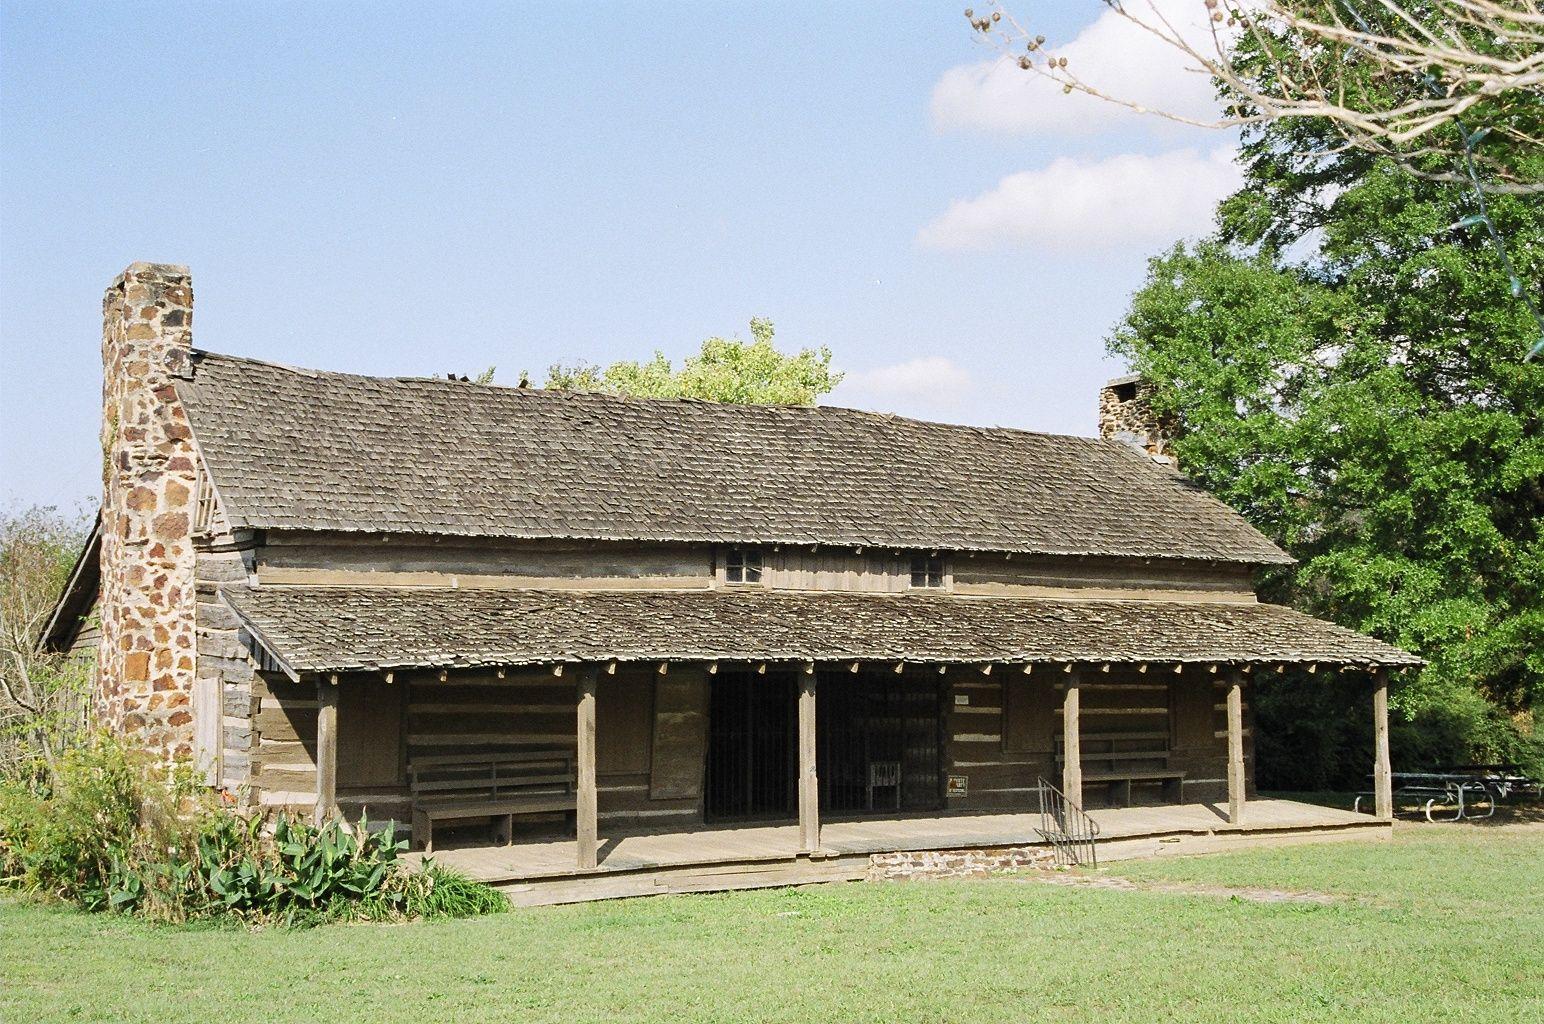 Log Cabin   Millardu0027s Crossing, Nacogdoches, TX (East Texas Film Commission)